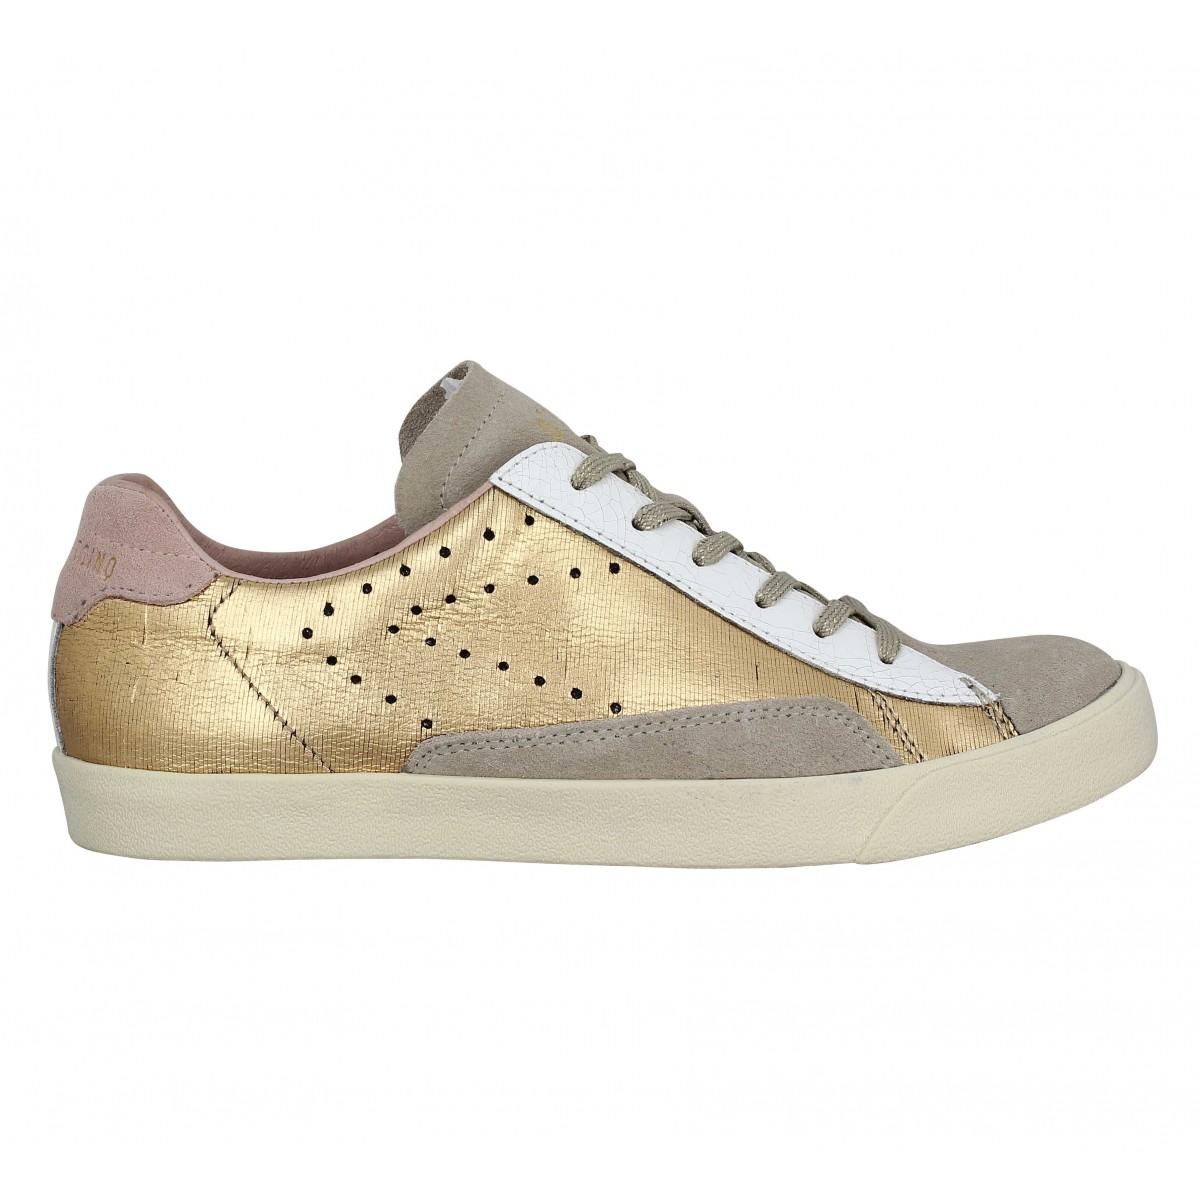 84f2c40f14 Femme Chaussures 0 Amazon Cuir Stan 105 Fanny Chris White wnnUfIq8